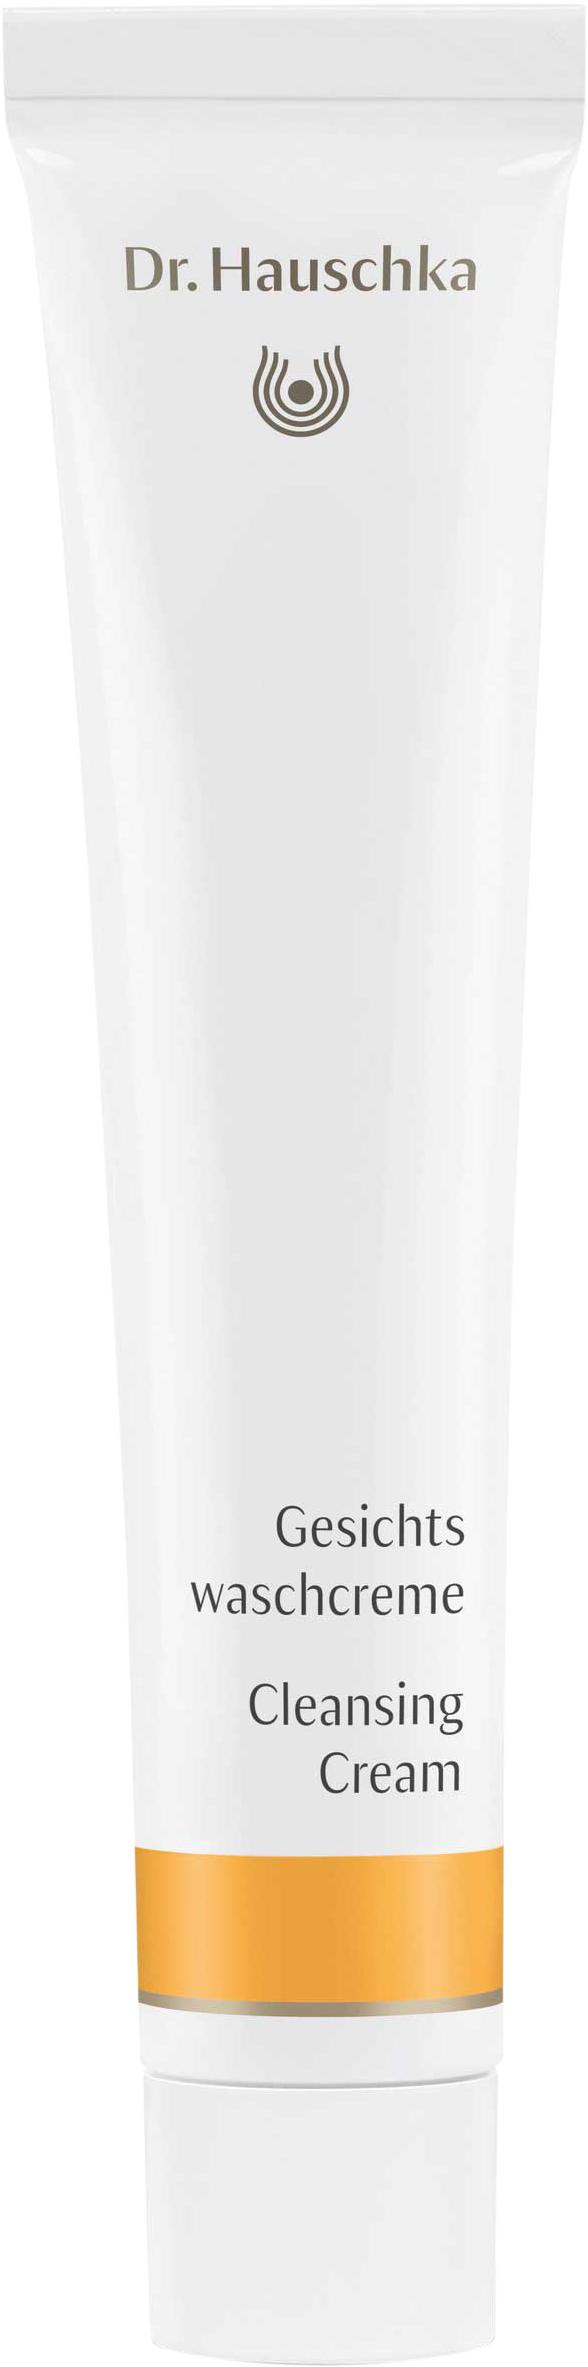 Dr. Hauschka - Cleansing Cream 50 ml